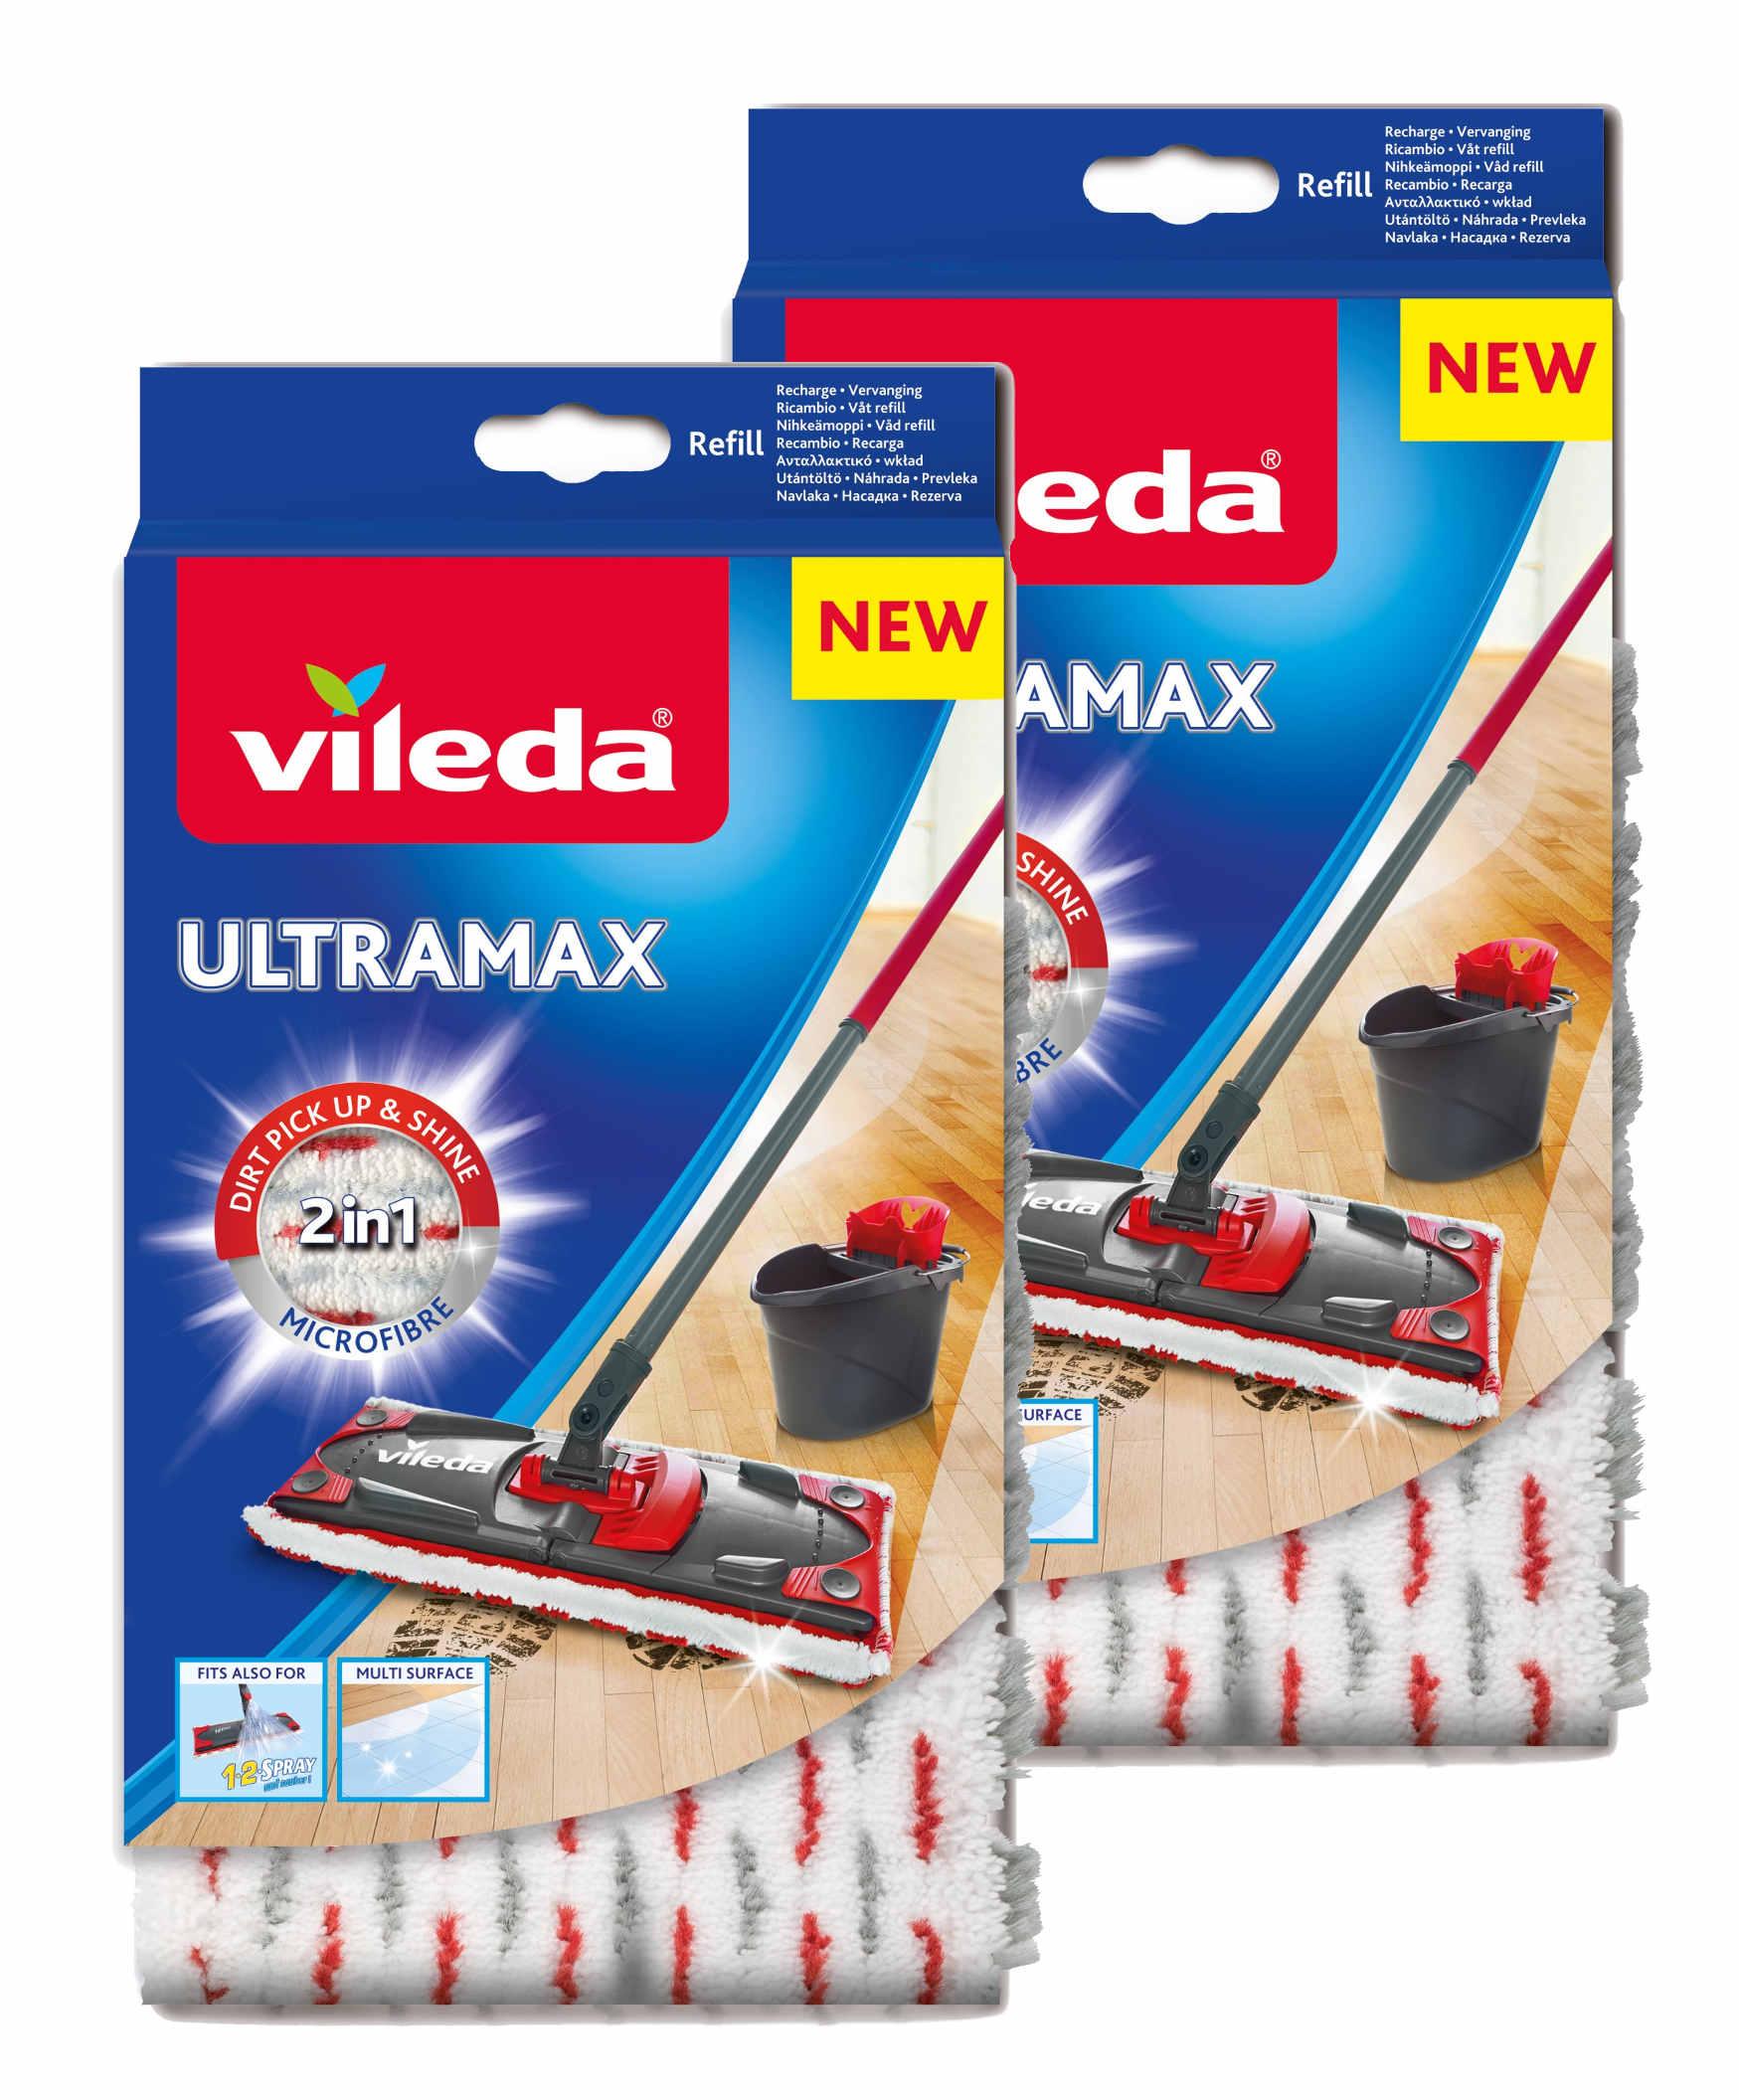 Вклад Швабры Vileda Ultramax Ultramat 1-2 Спрей 2шт